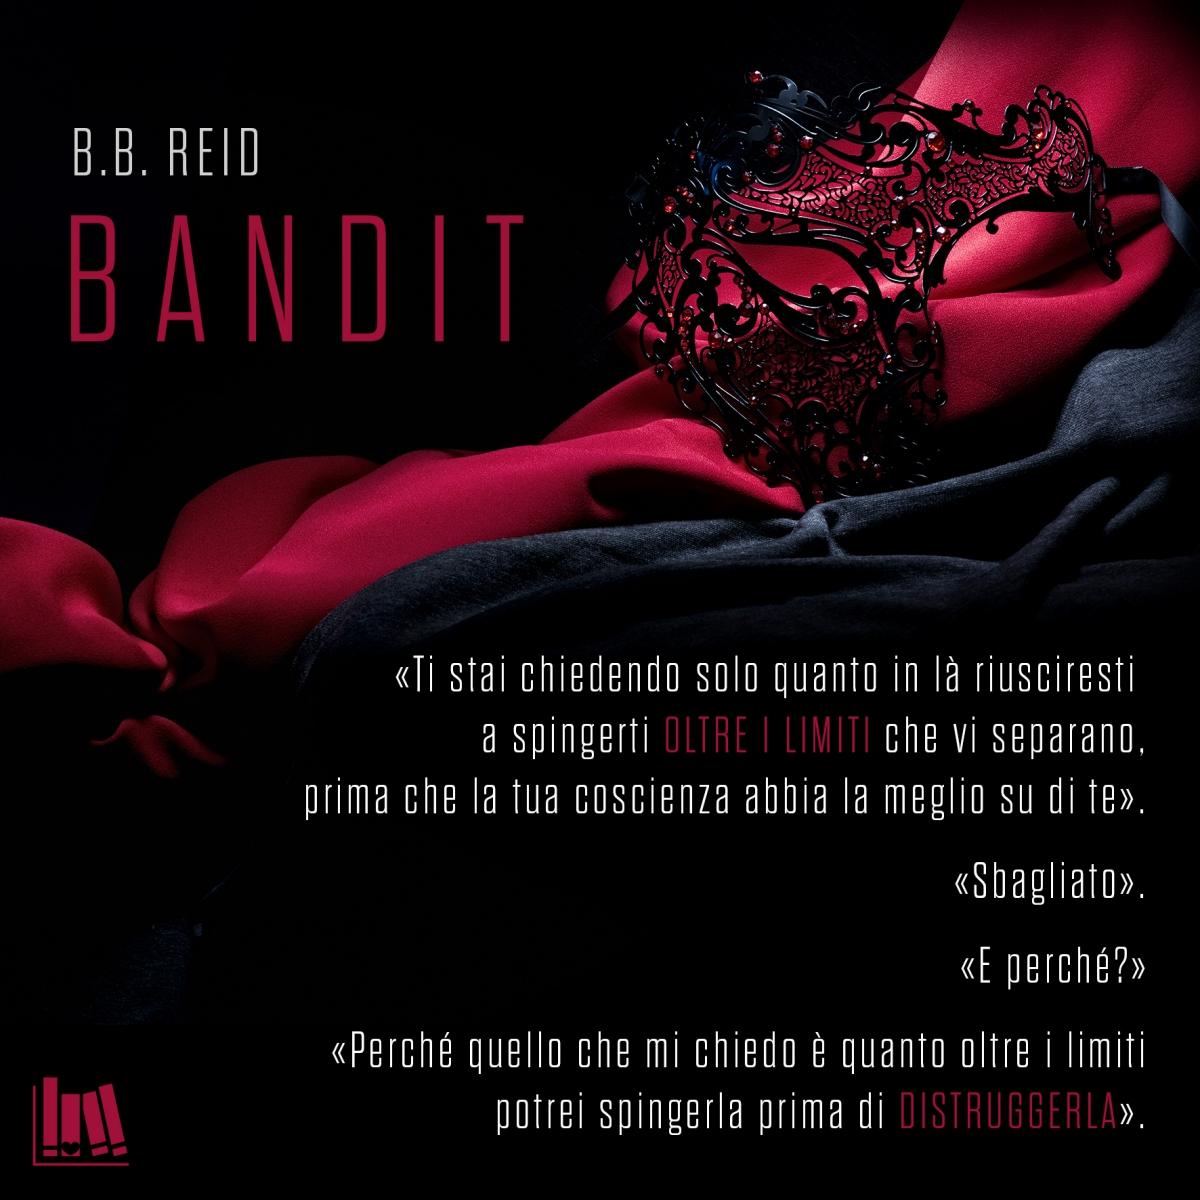 bandit-Reid-Teaser